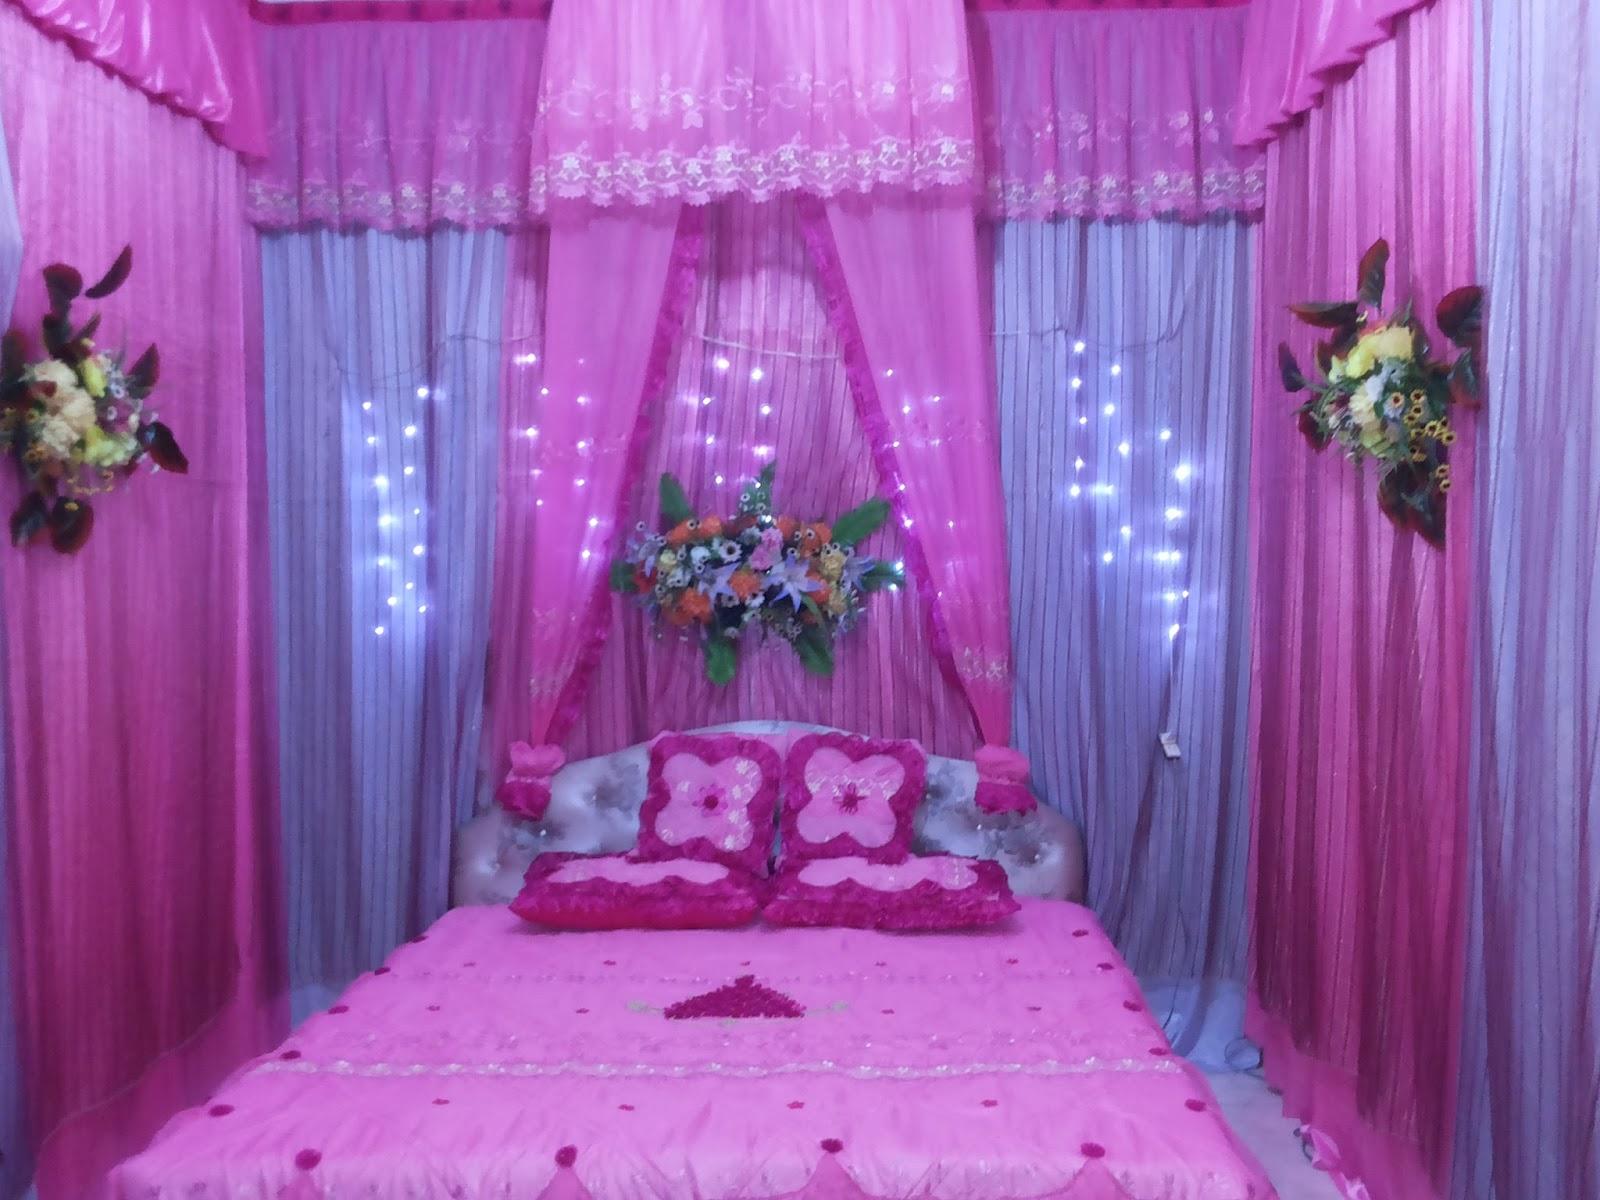 dekorasi kamar pengantin warna pink, wajib baca